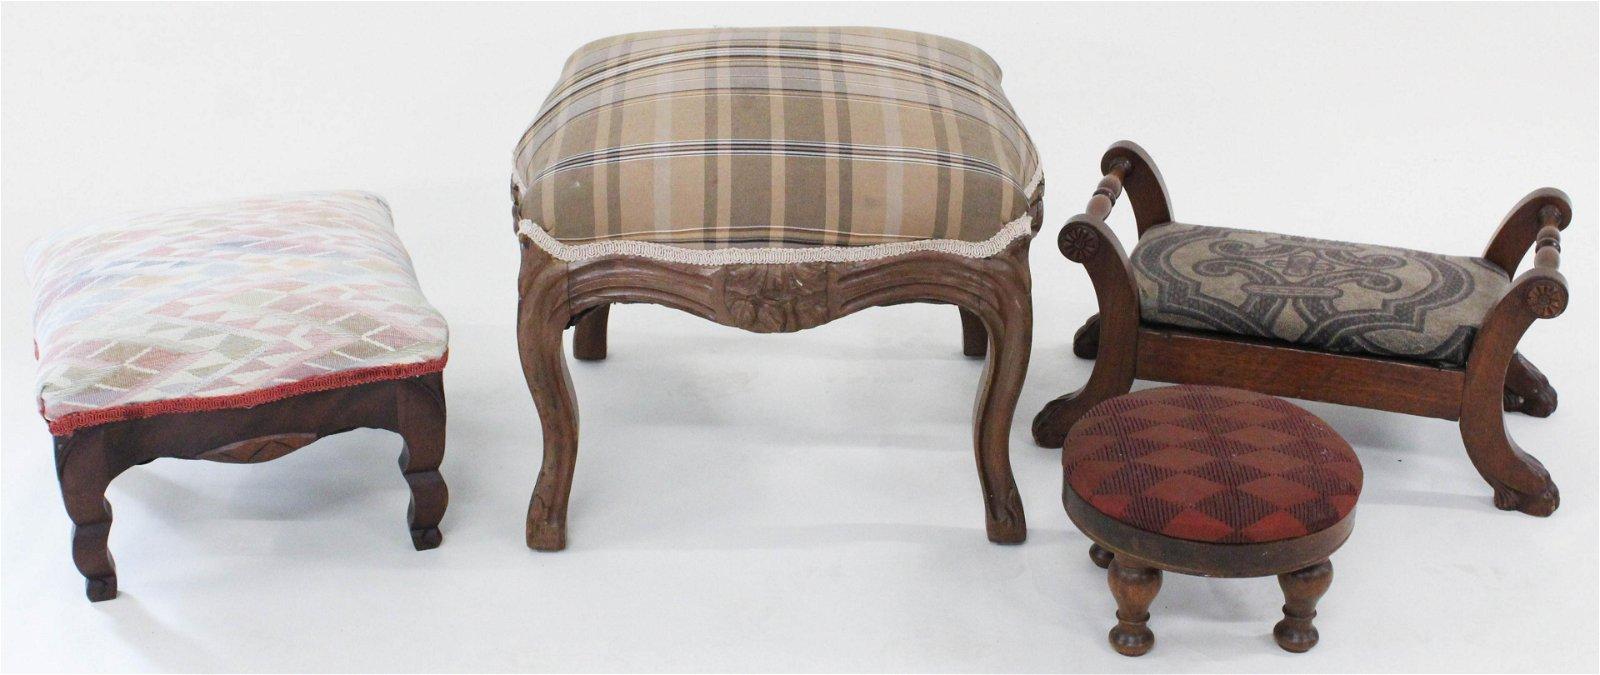 Group of 4 Decorative Walnut Footstools